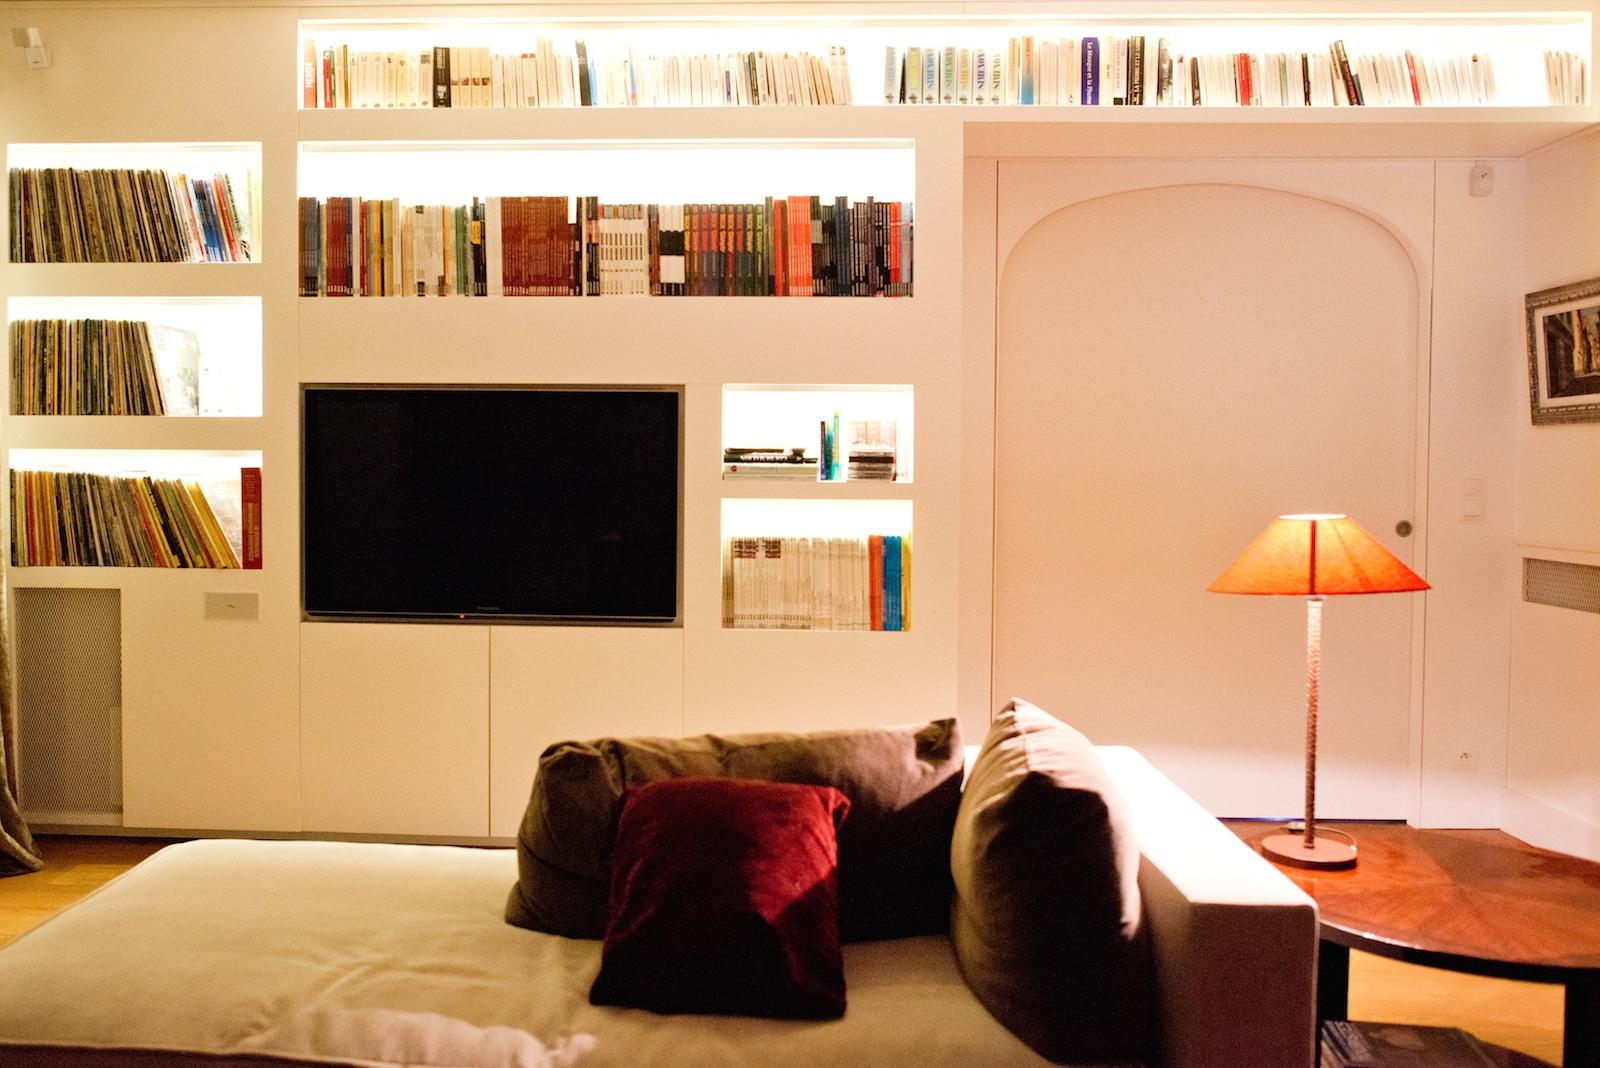 agencement-interieur-decoration-interieur-fabrication-meuble-bayonne-64-darrieumerlou-11